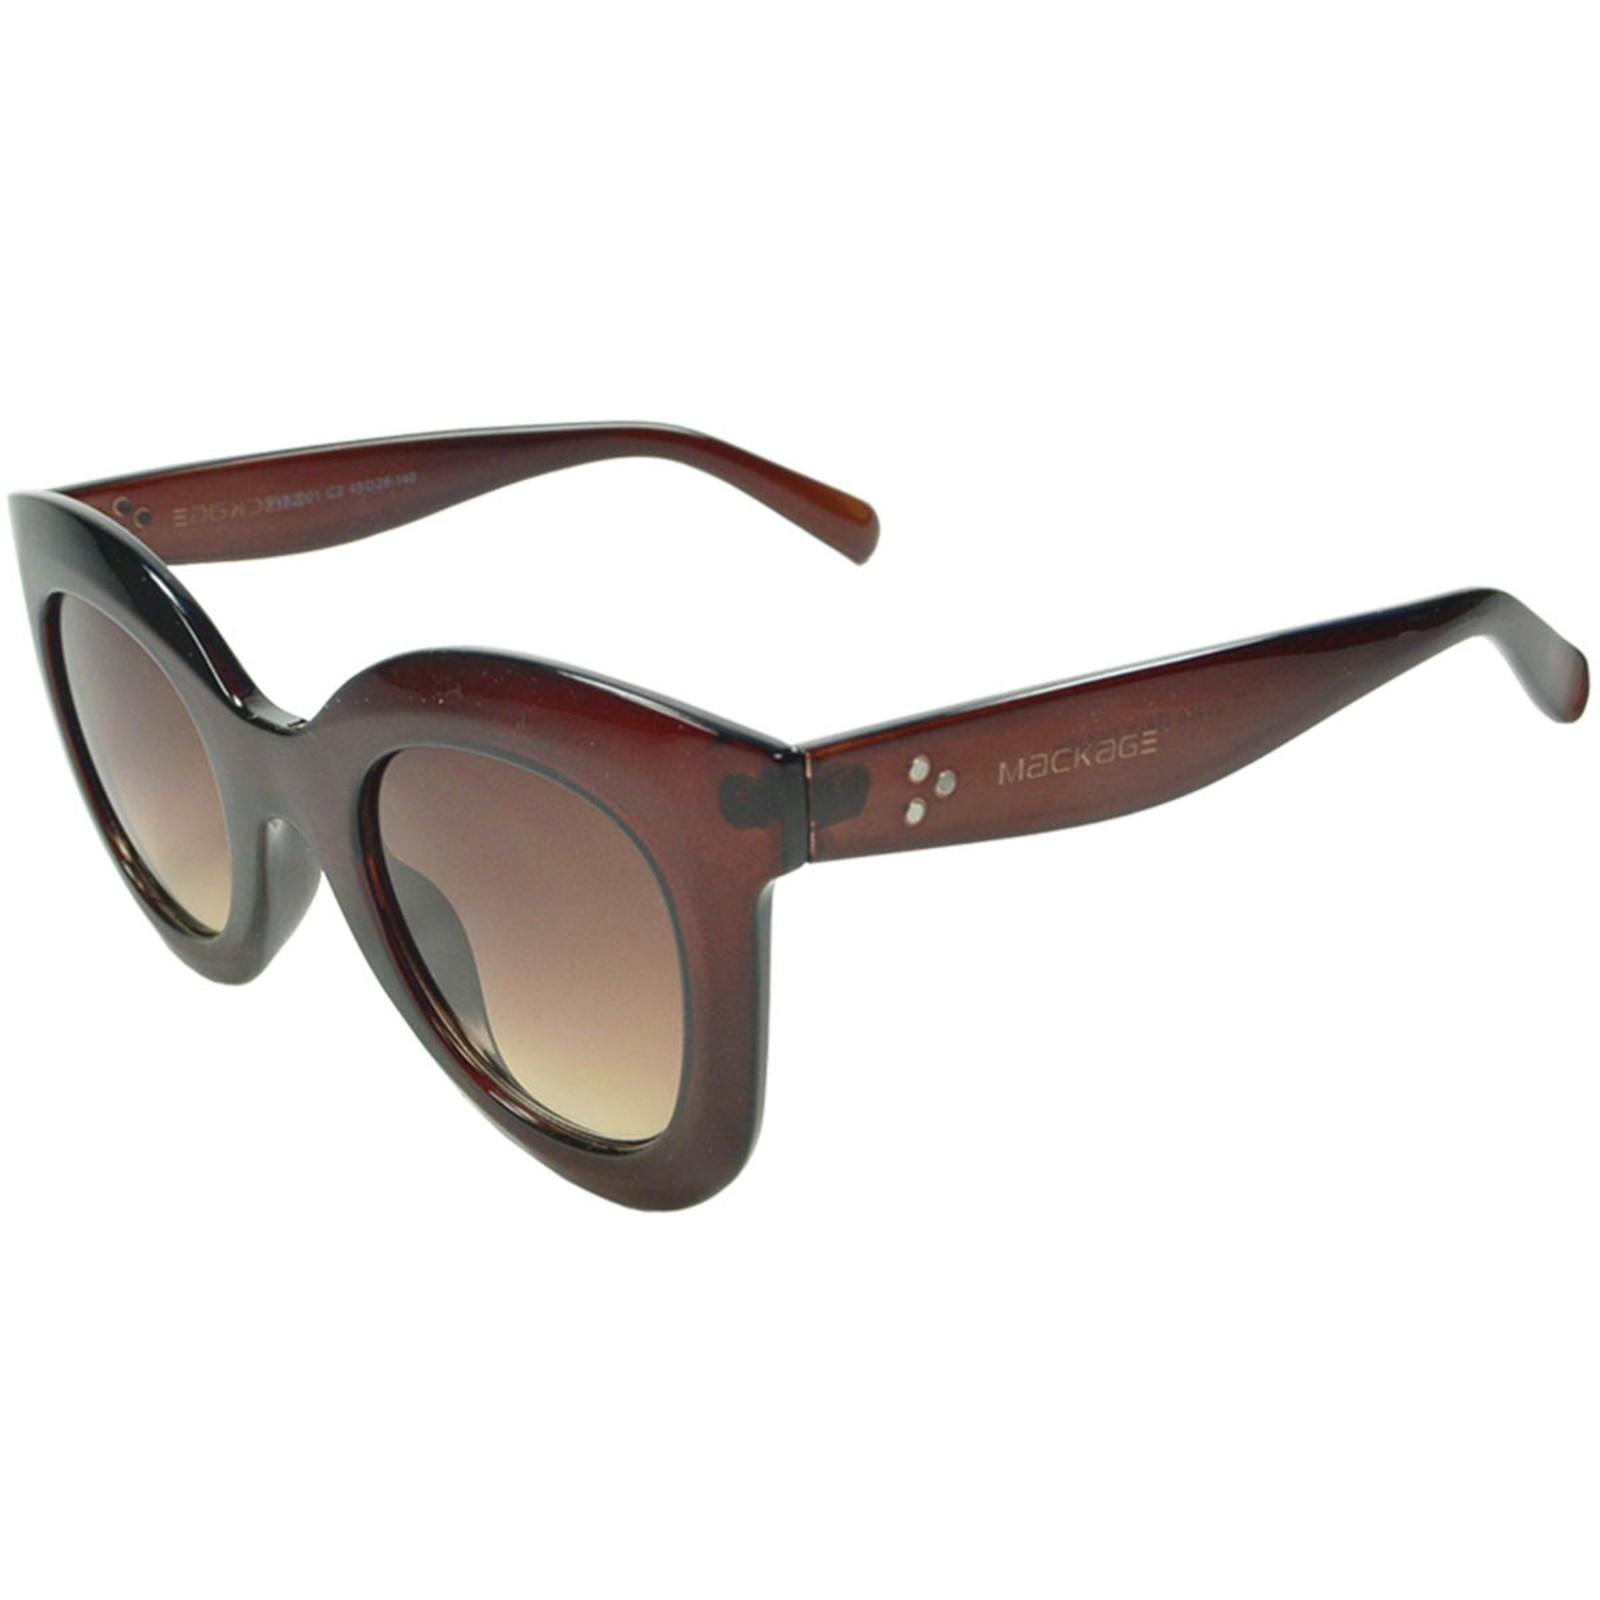 Óculos De Sol Mackage Acetato Feminino Oversize Redondo Retrô - Marrom